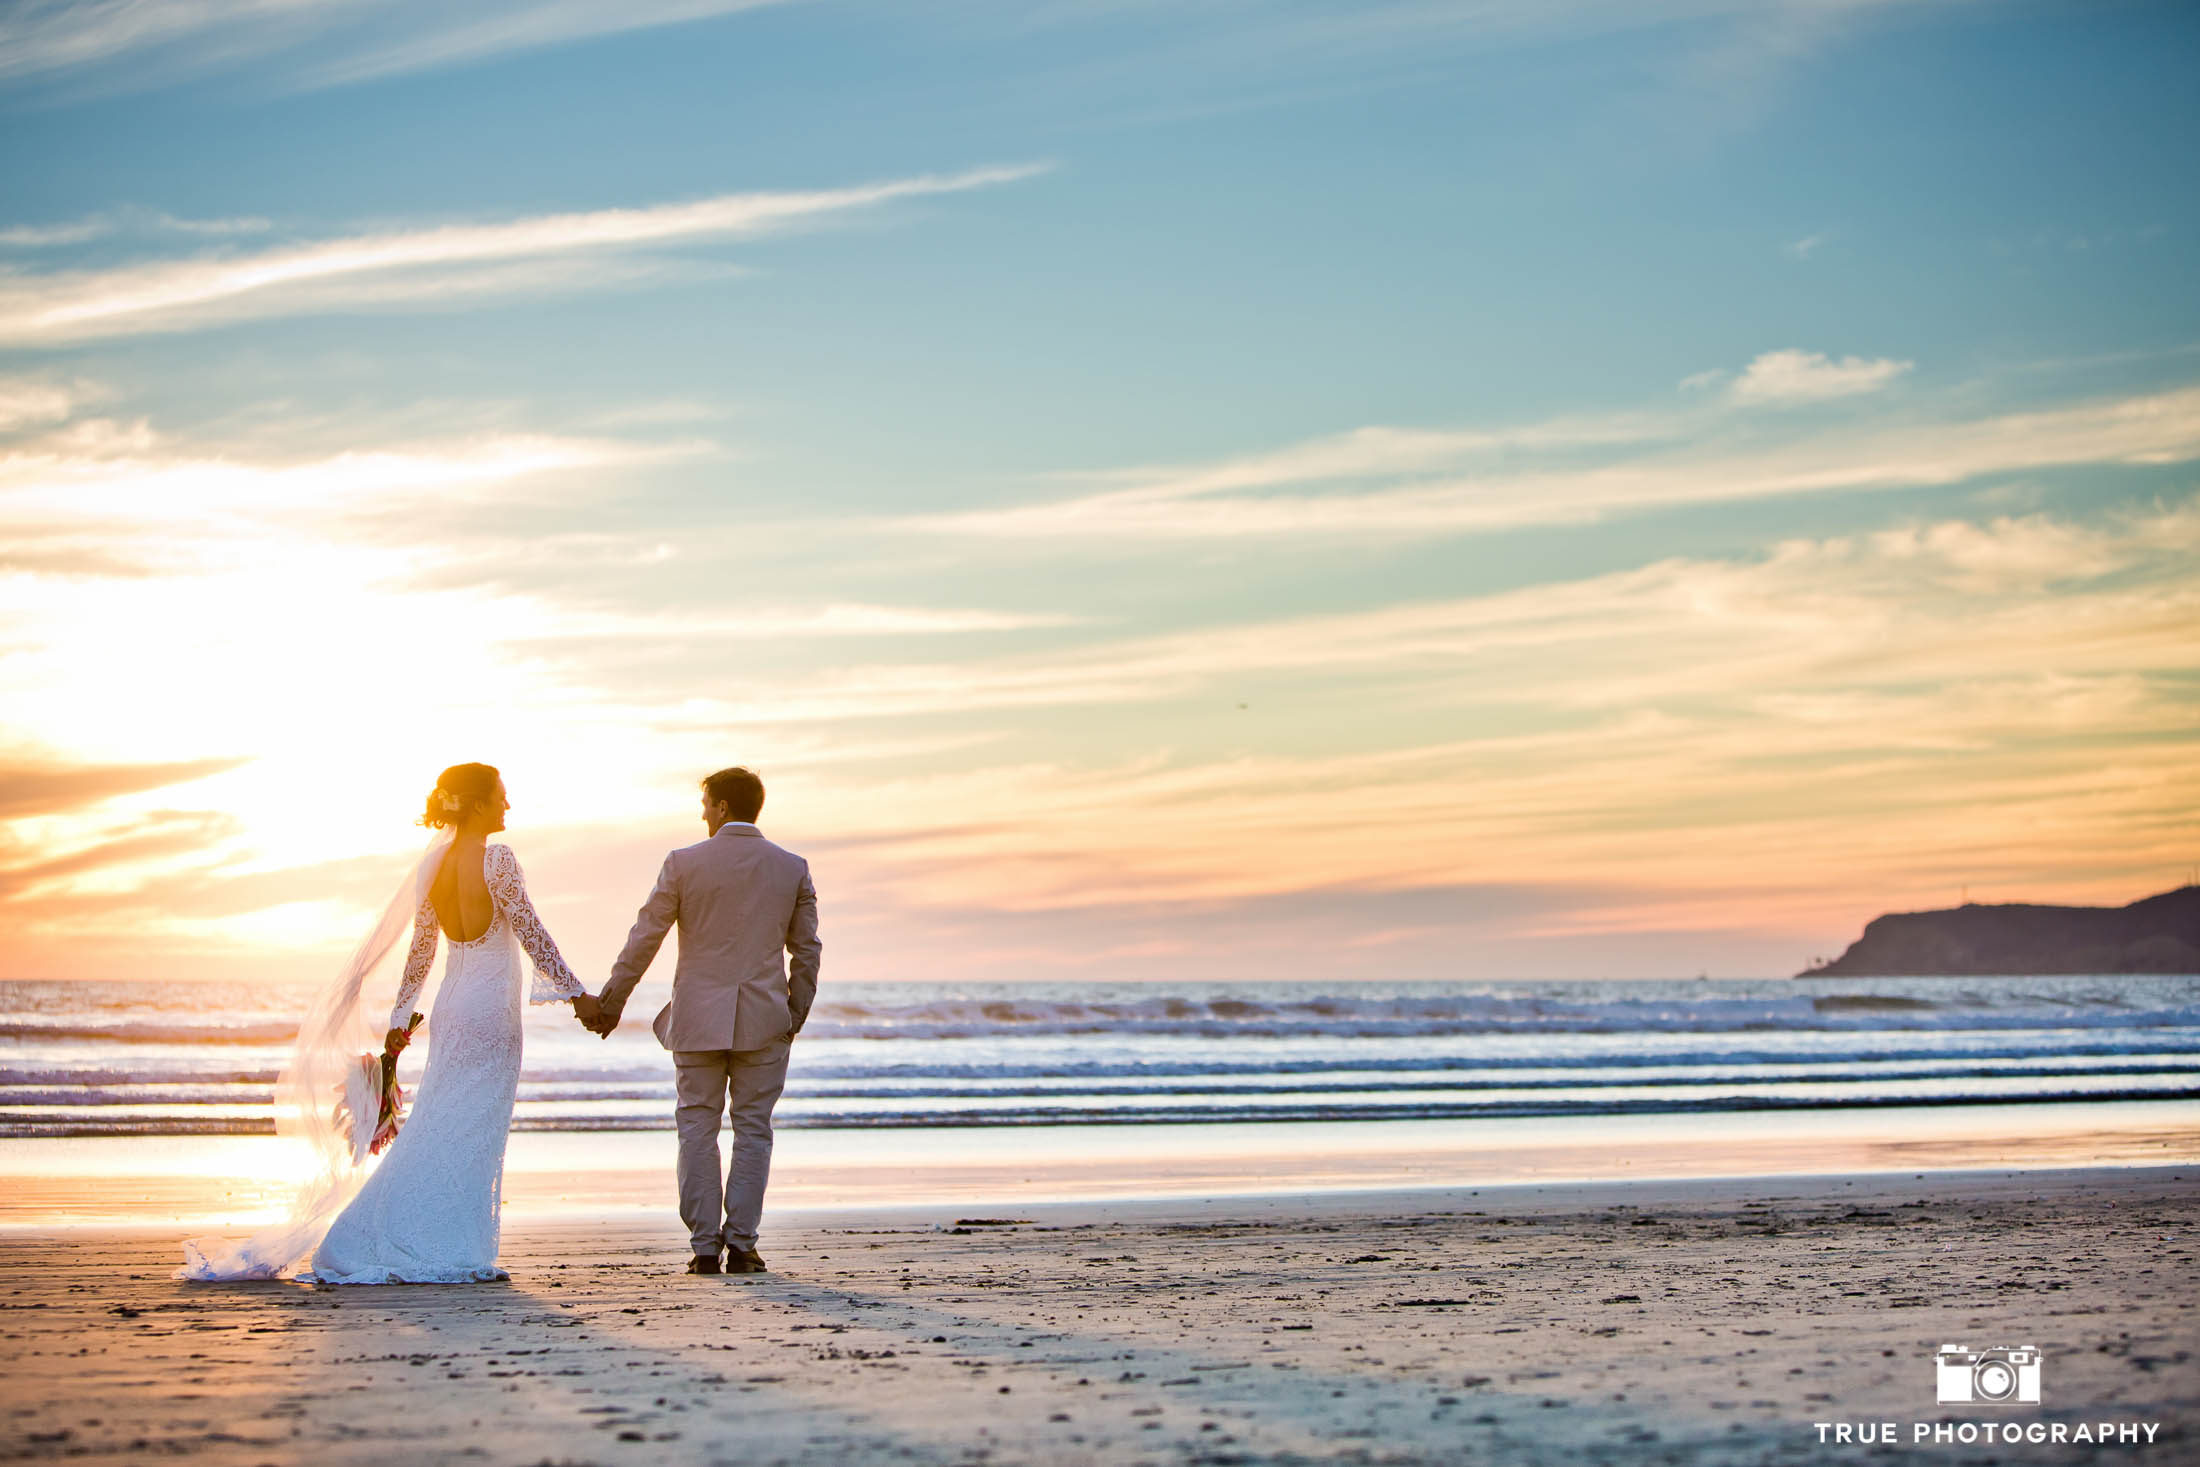 Sunset newlyweds portrait on the beach at Coronado Island